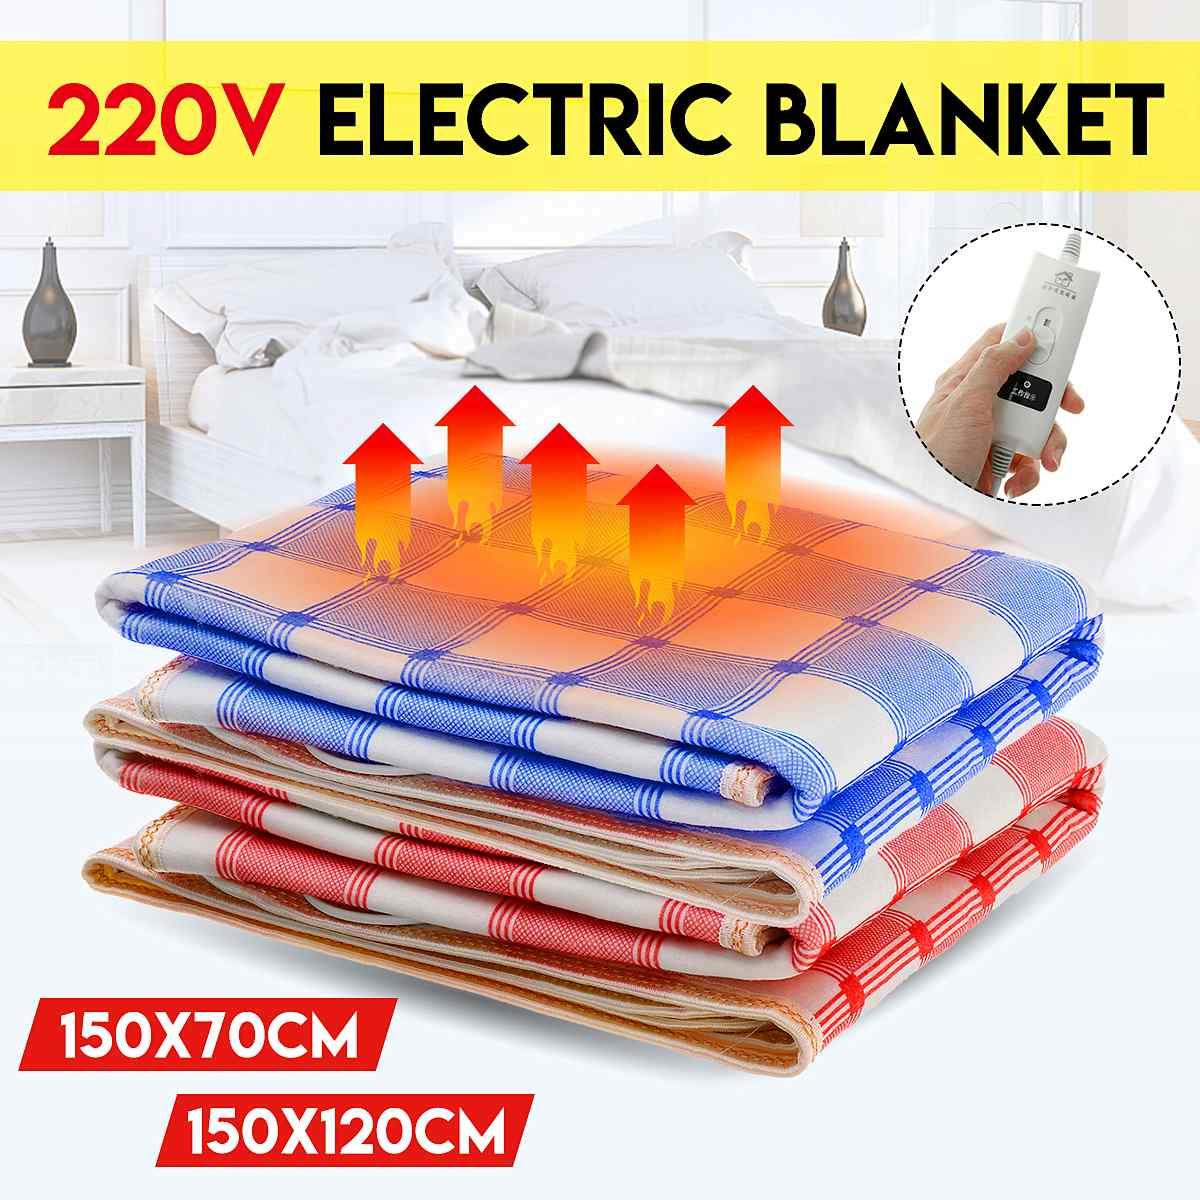 220V Electric Warm 4 + Electric Heating Blanket <font><b>Mattress</b></font> Body